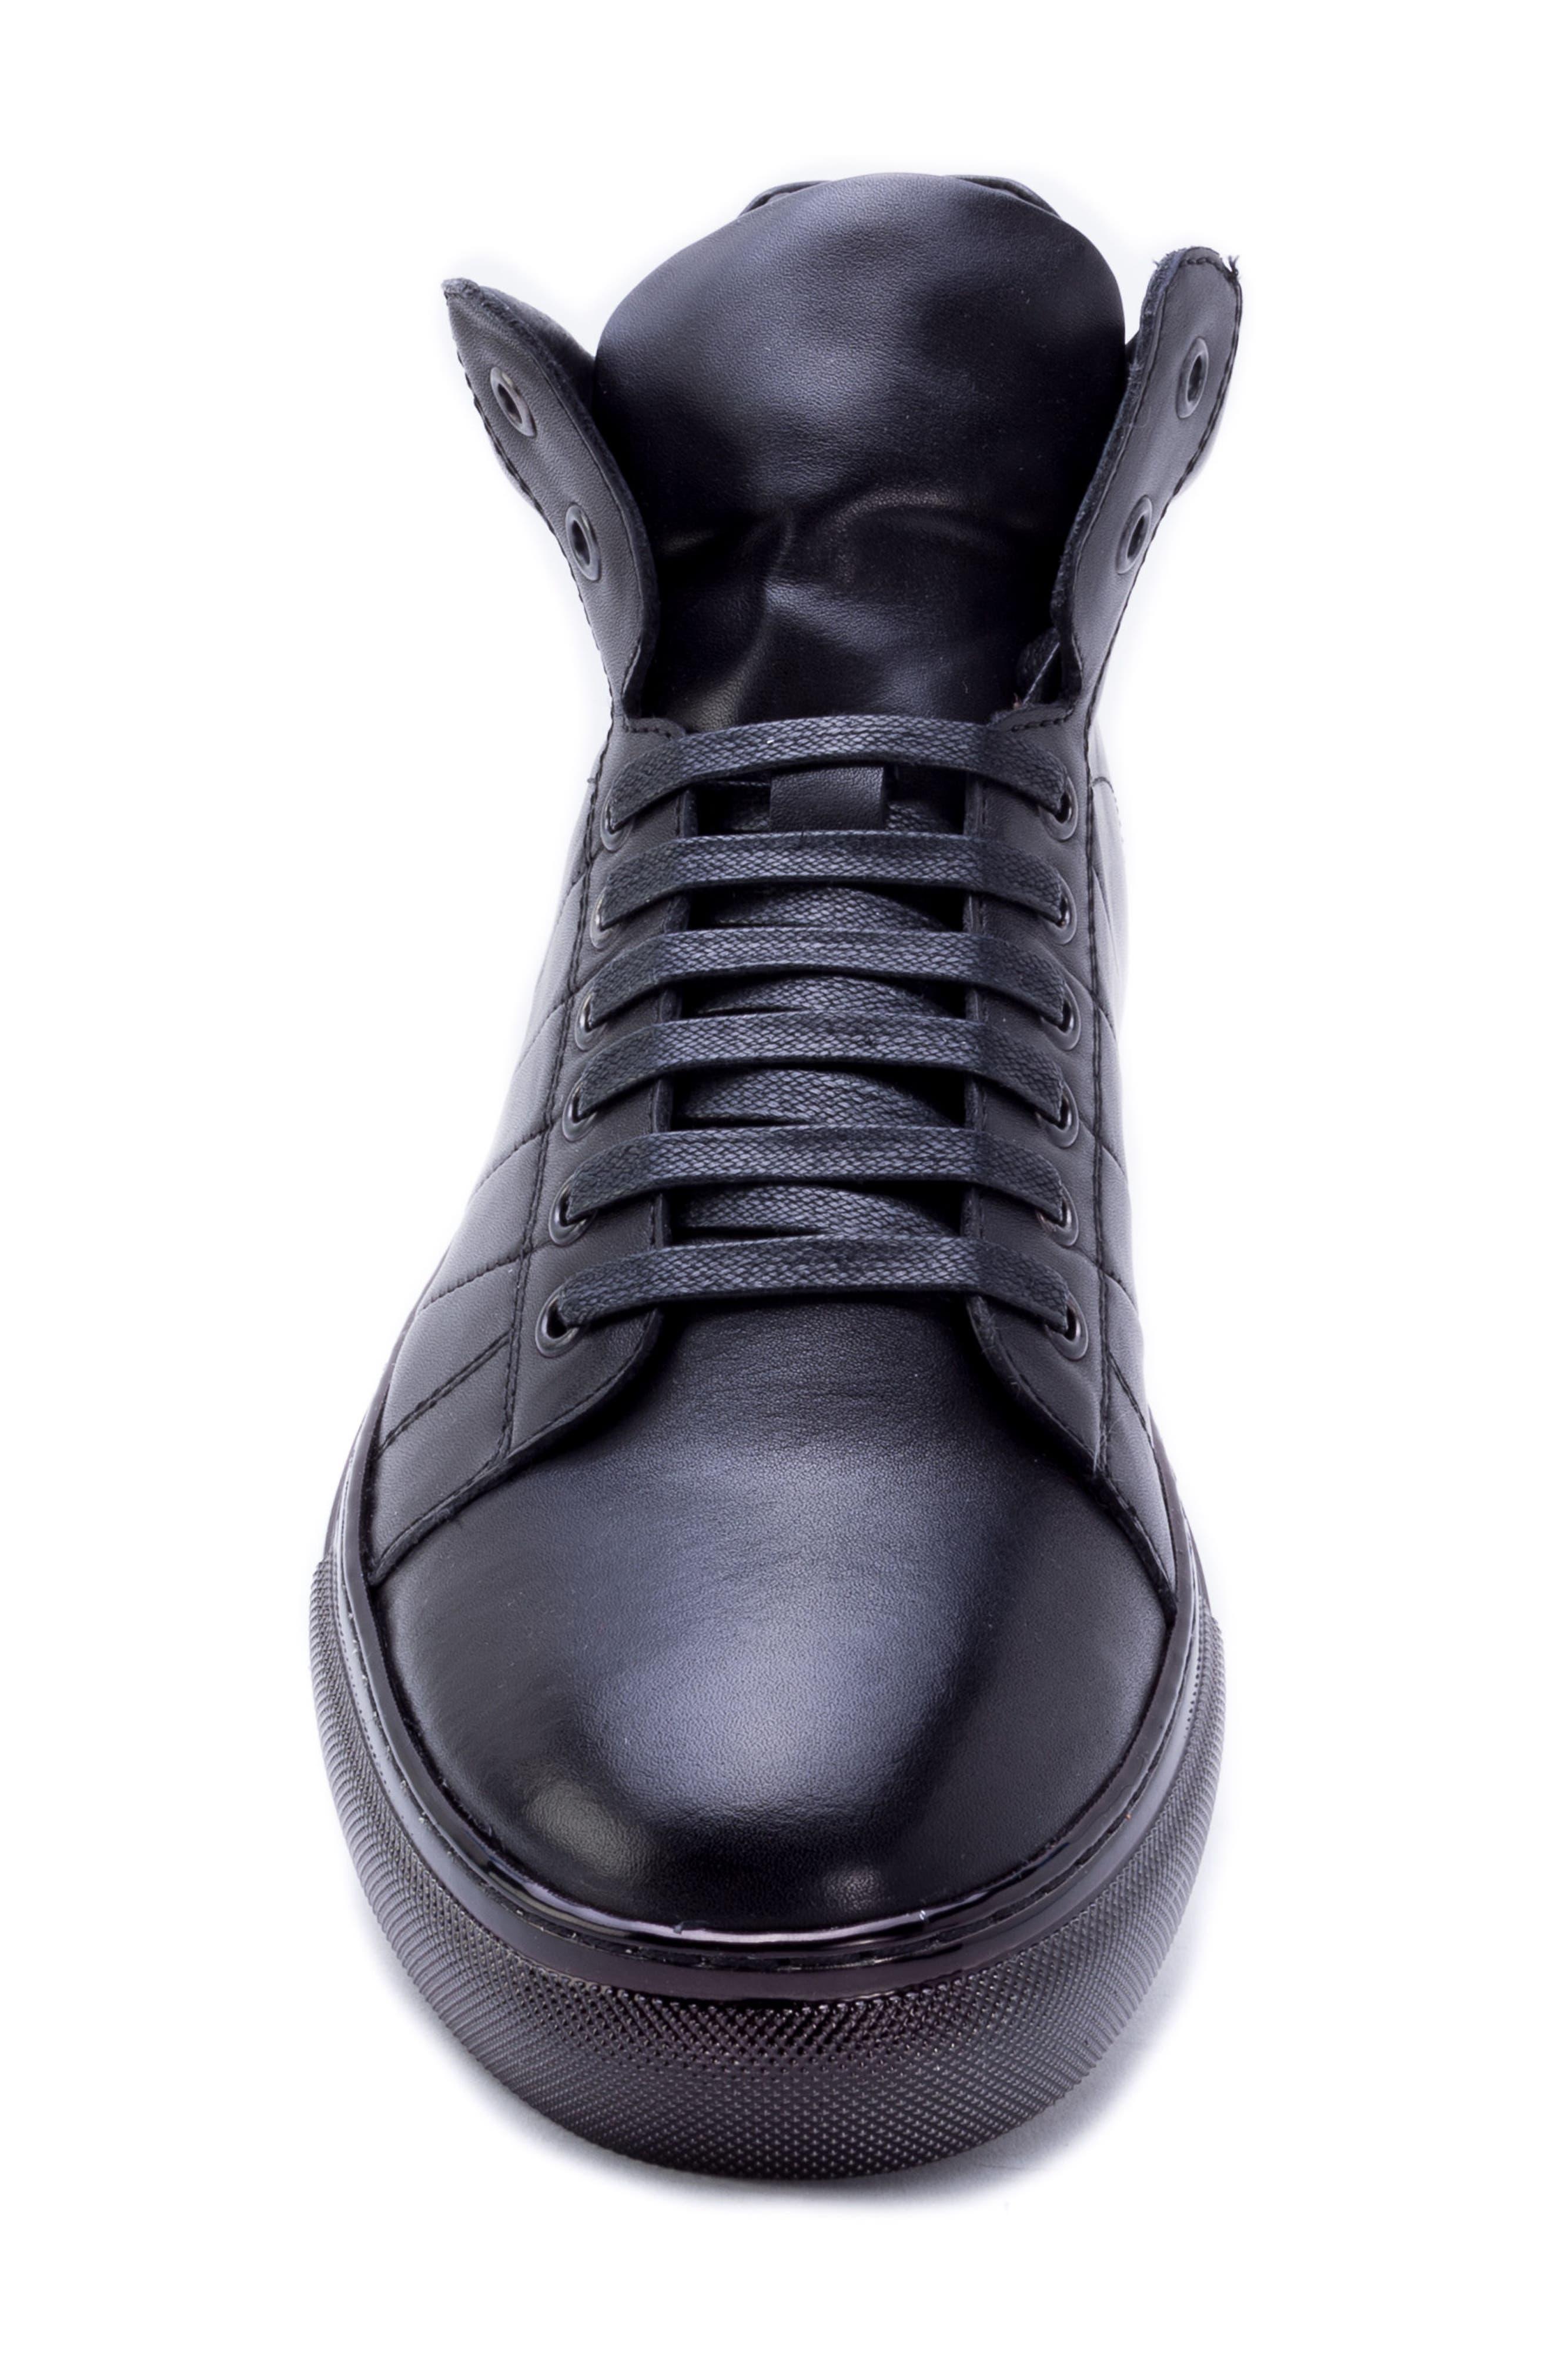 Crosby Sneaker,                             Alternate thumbnail 5, color,                             BLACK LEATHER